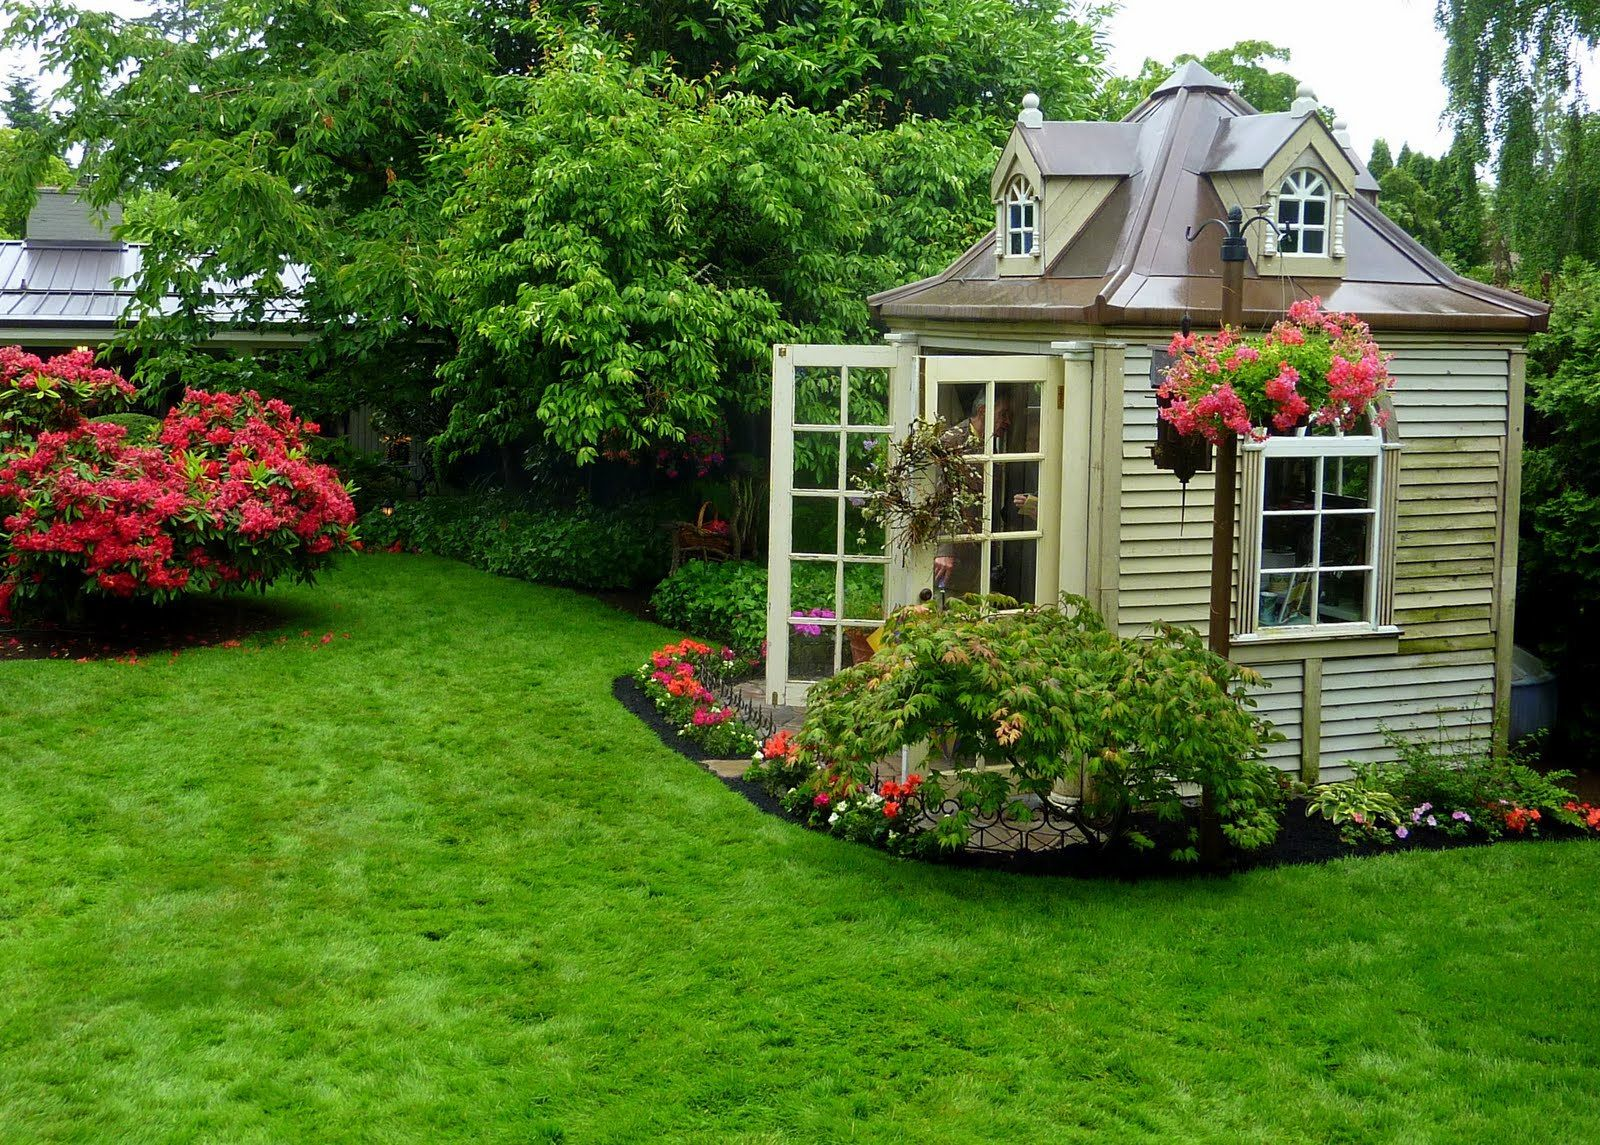 Gardens For Small Houses Bill House Plans House Garden Garden